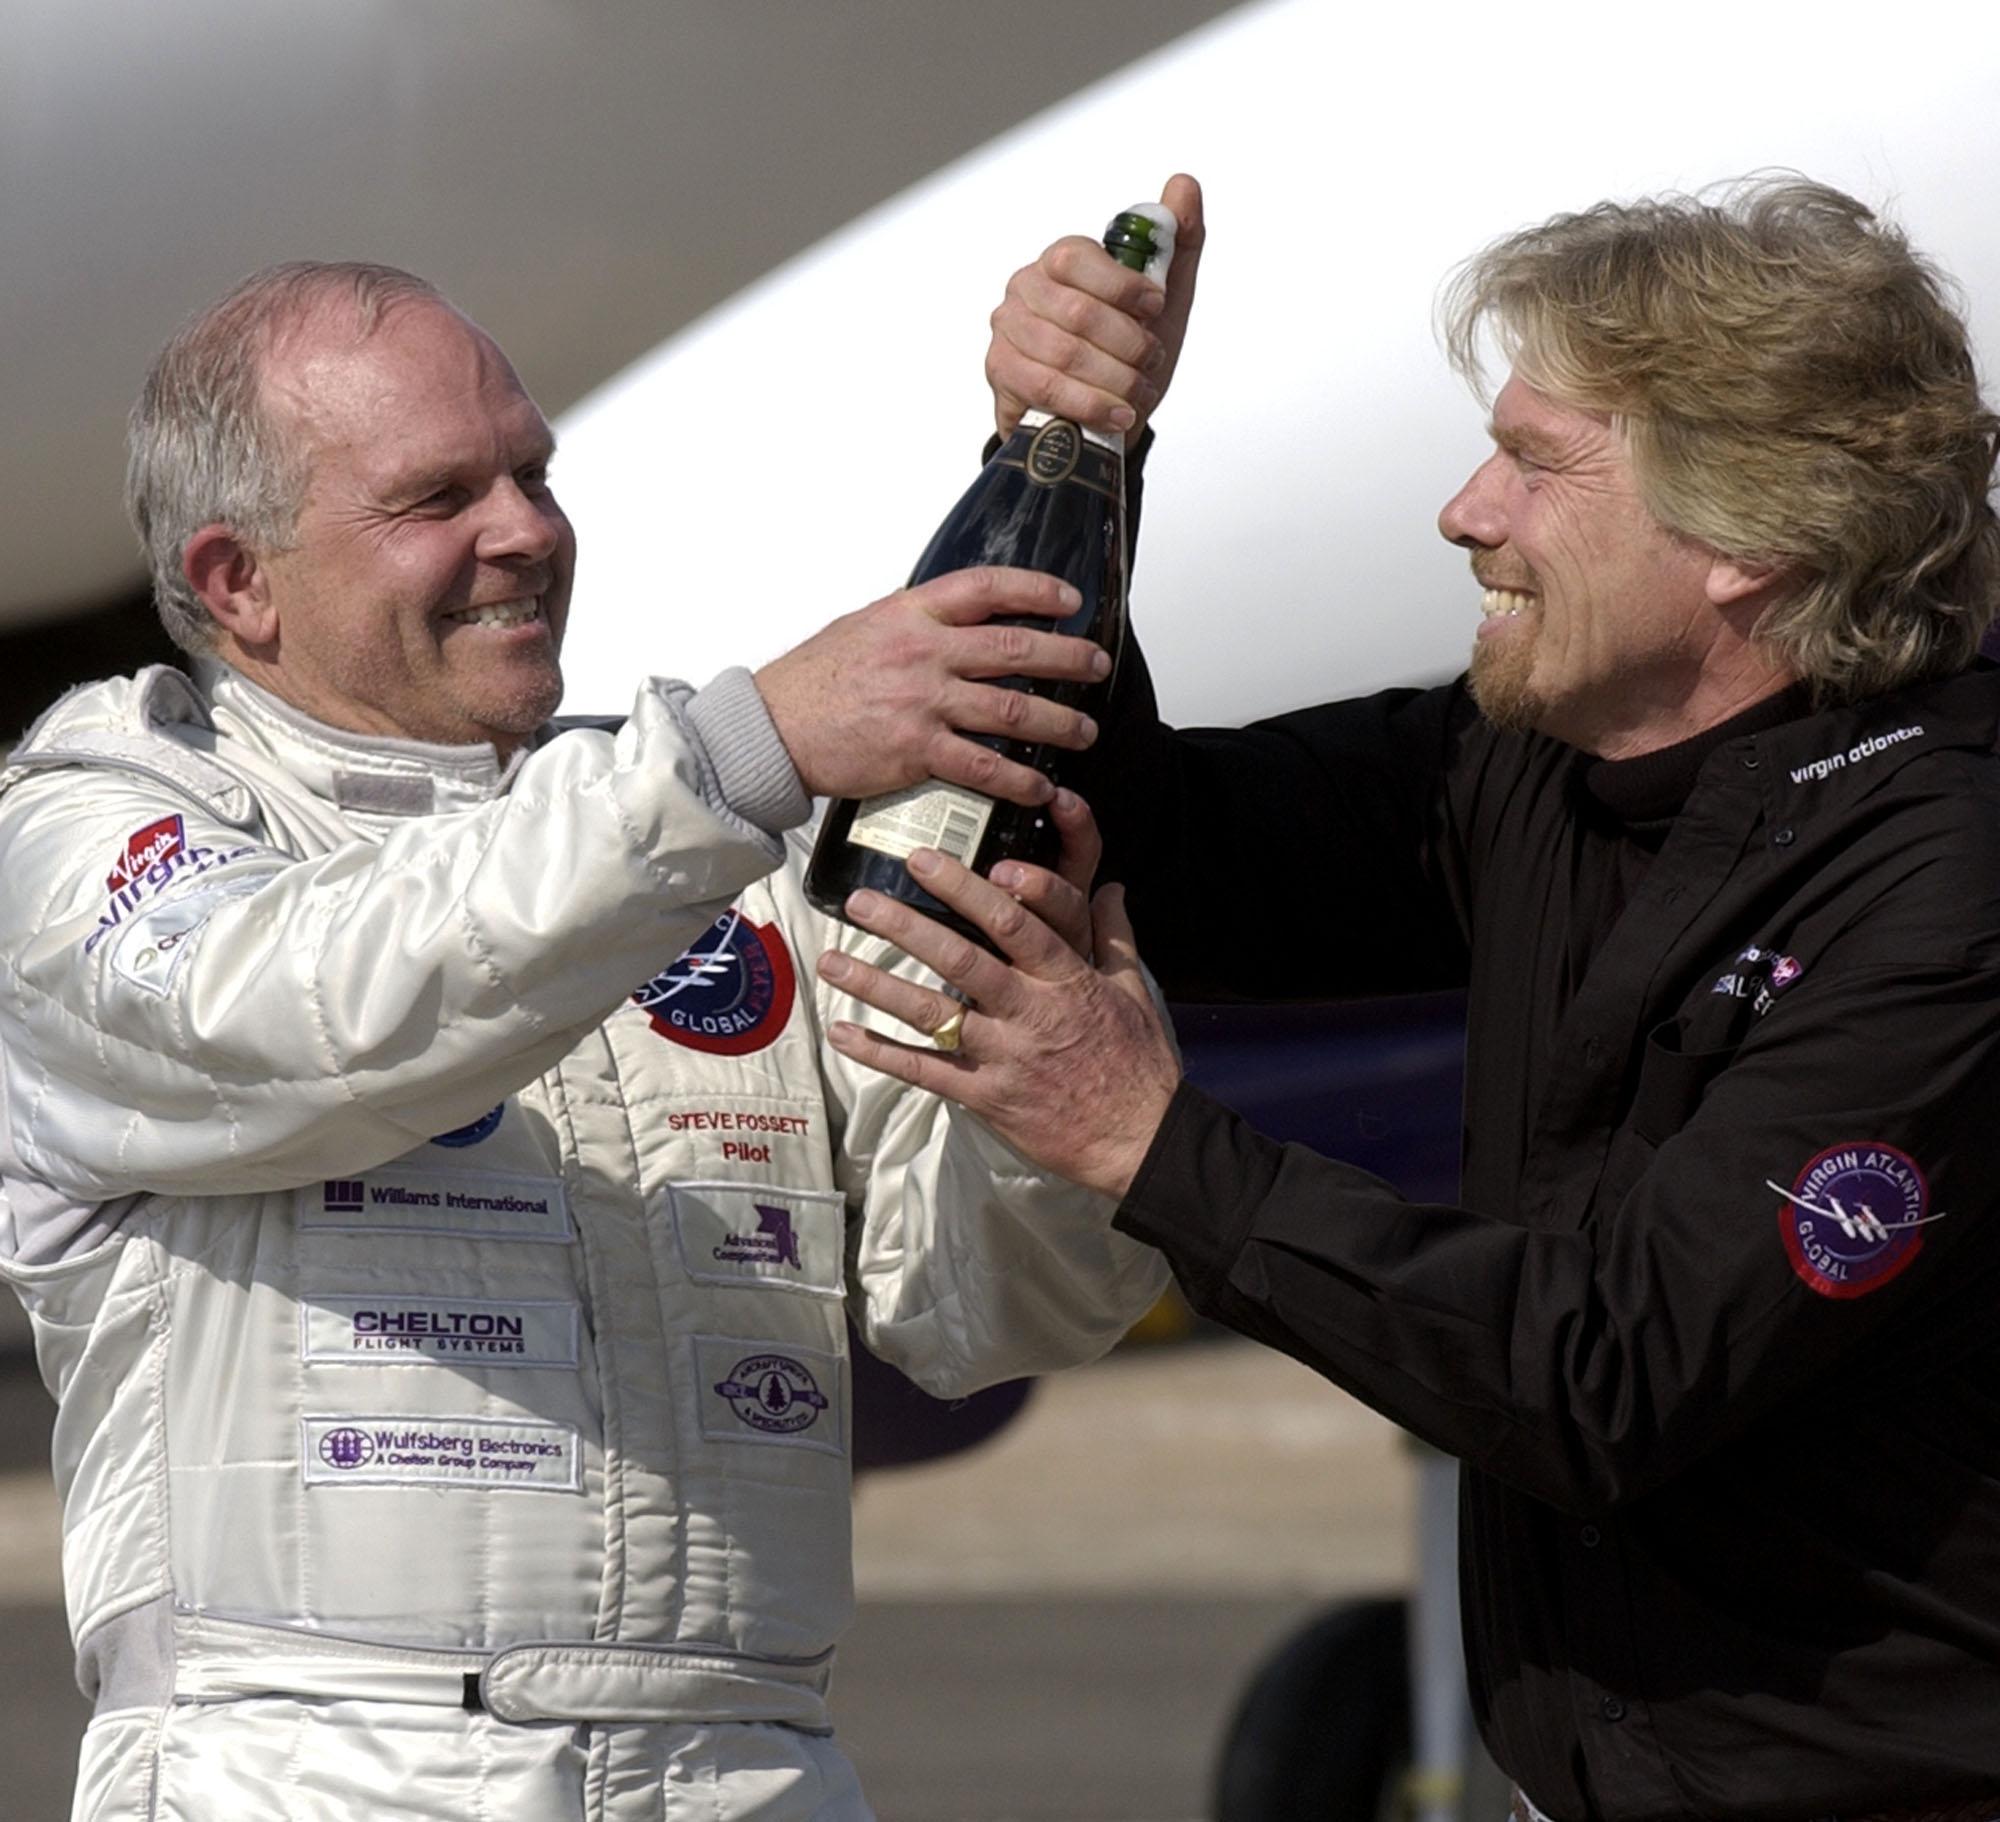 Fossett於2005年3月1日駕駛的「維珍航空環球飛行者」號返回起點Salina機場。贊助他完成壯舉的維珍航空創辦人布蘭森(Richard Branson)在機場開香檳慶賀。文:許振輝/圖:美聯社